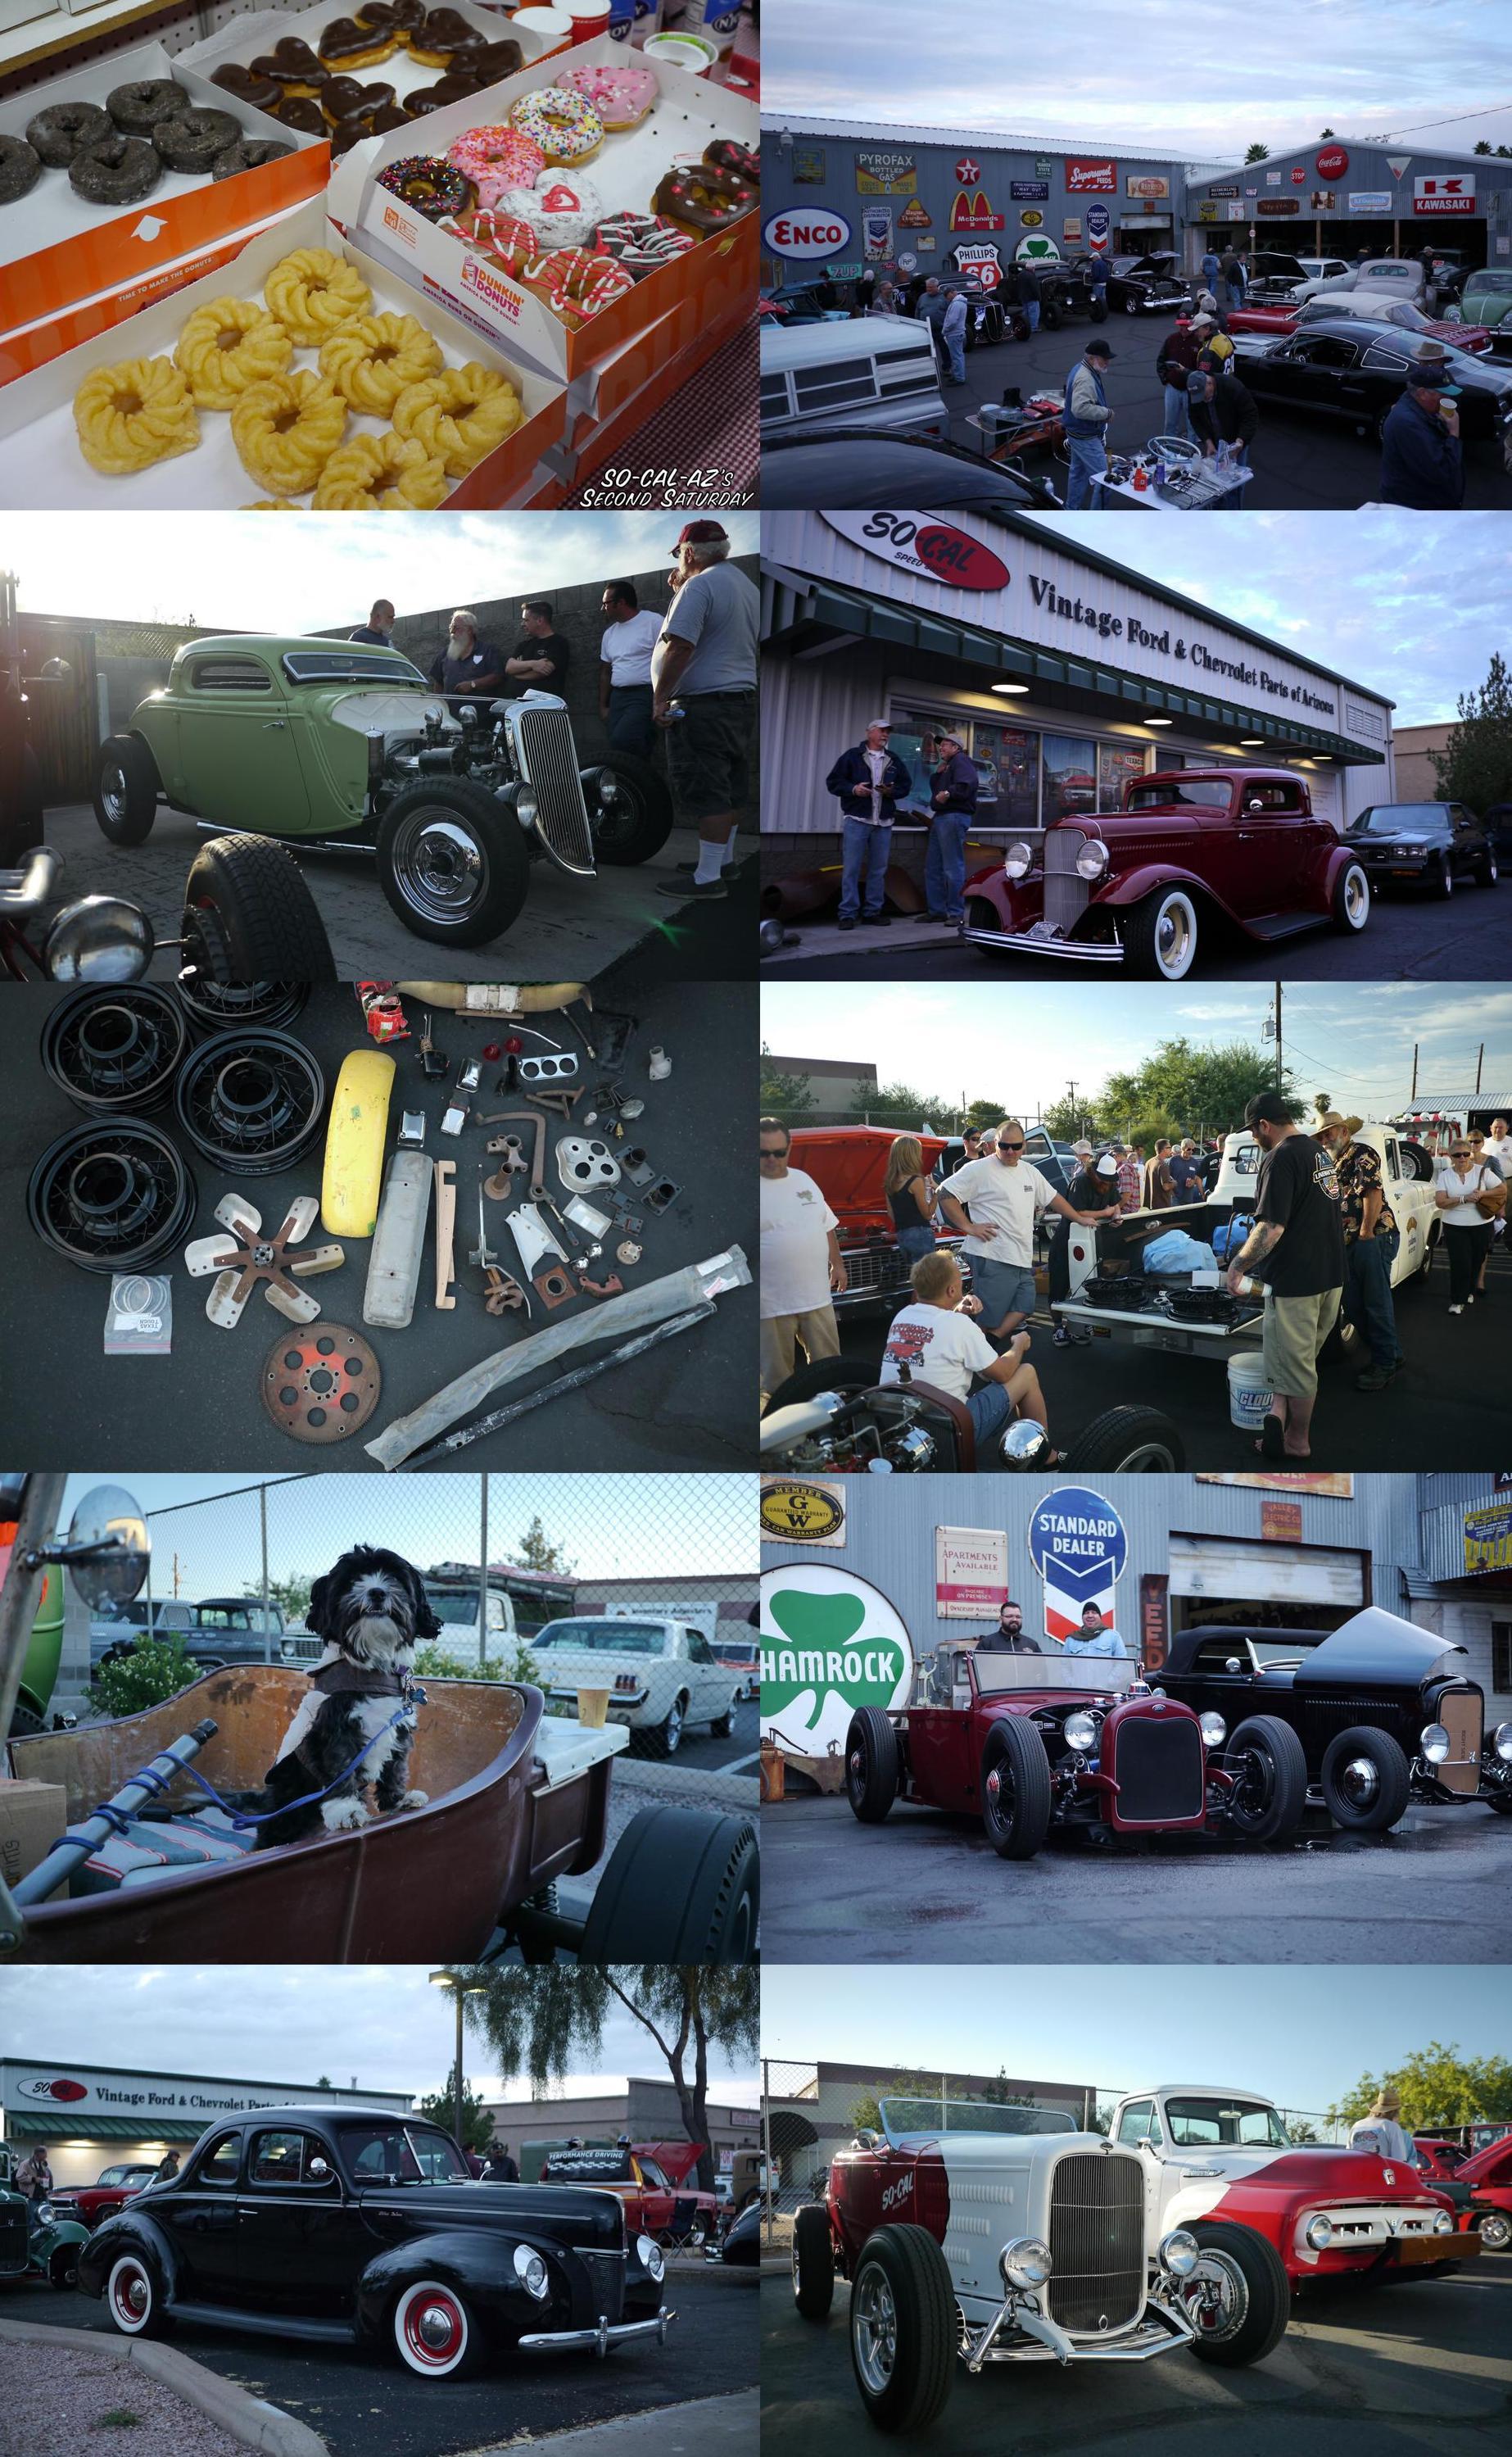 11.4-so-cal-speed-shop-arizona-second-saturday-car-show-swap-meetup-.jpg